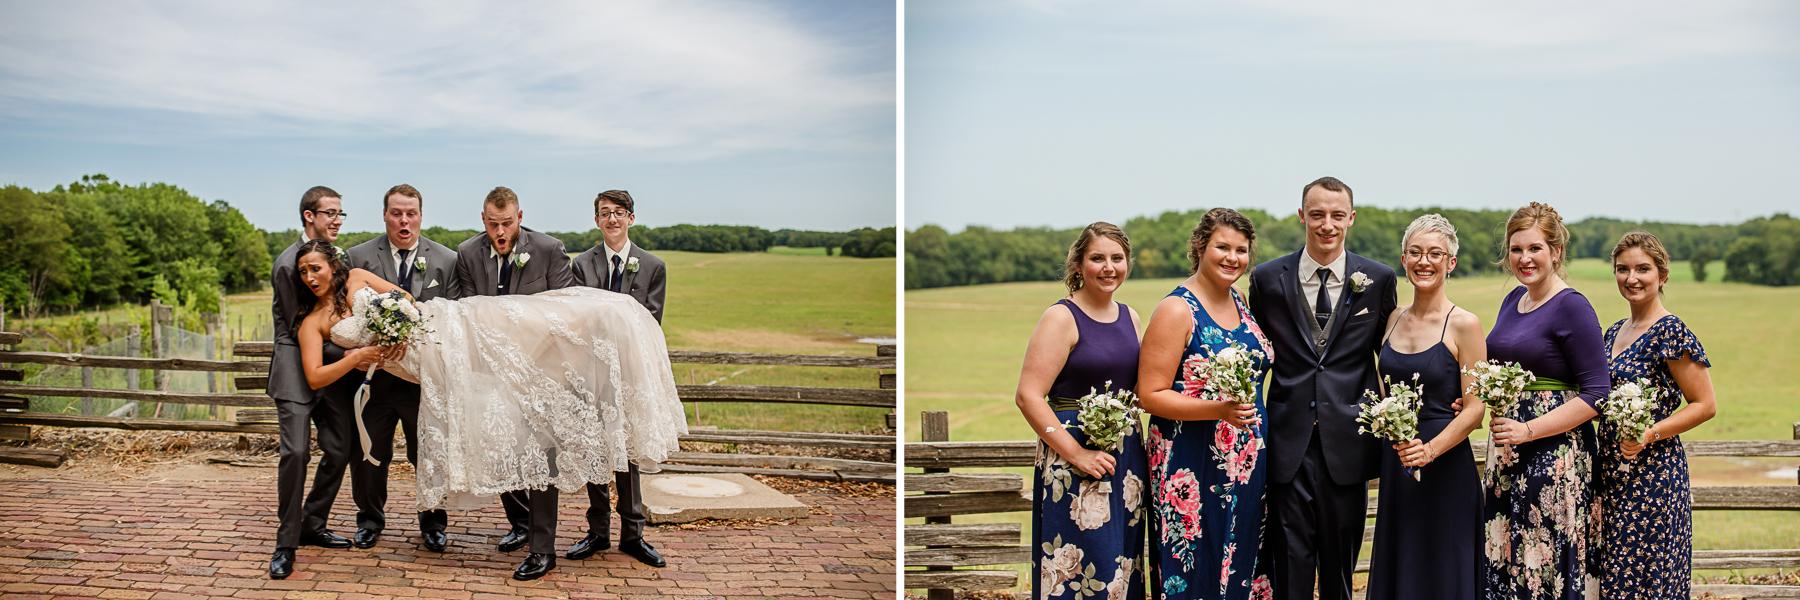 Wildlife Prairie Park Wedding Party